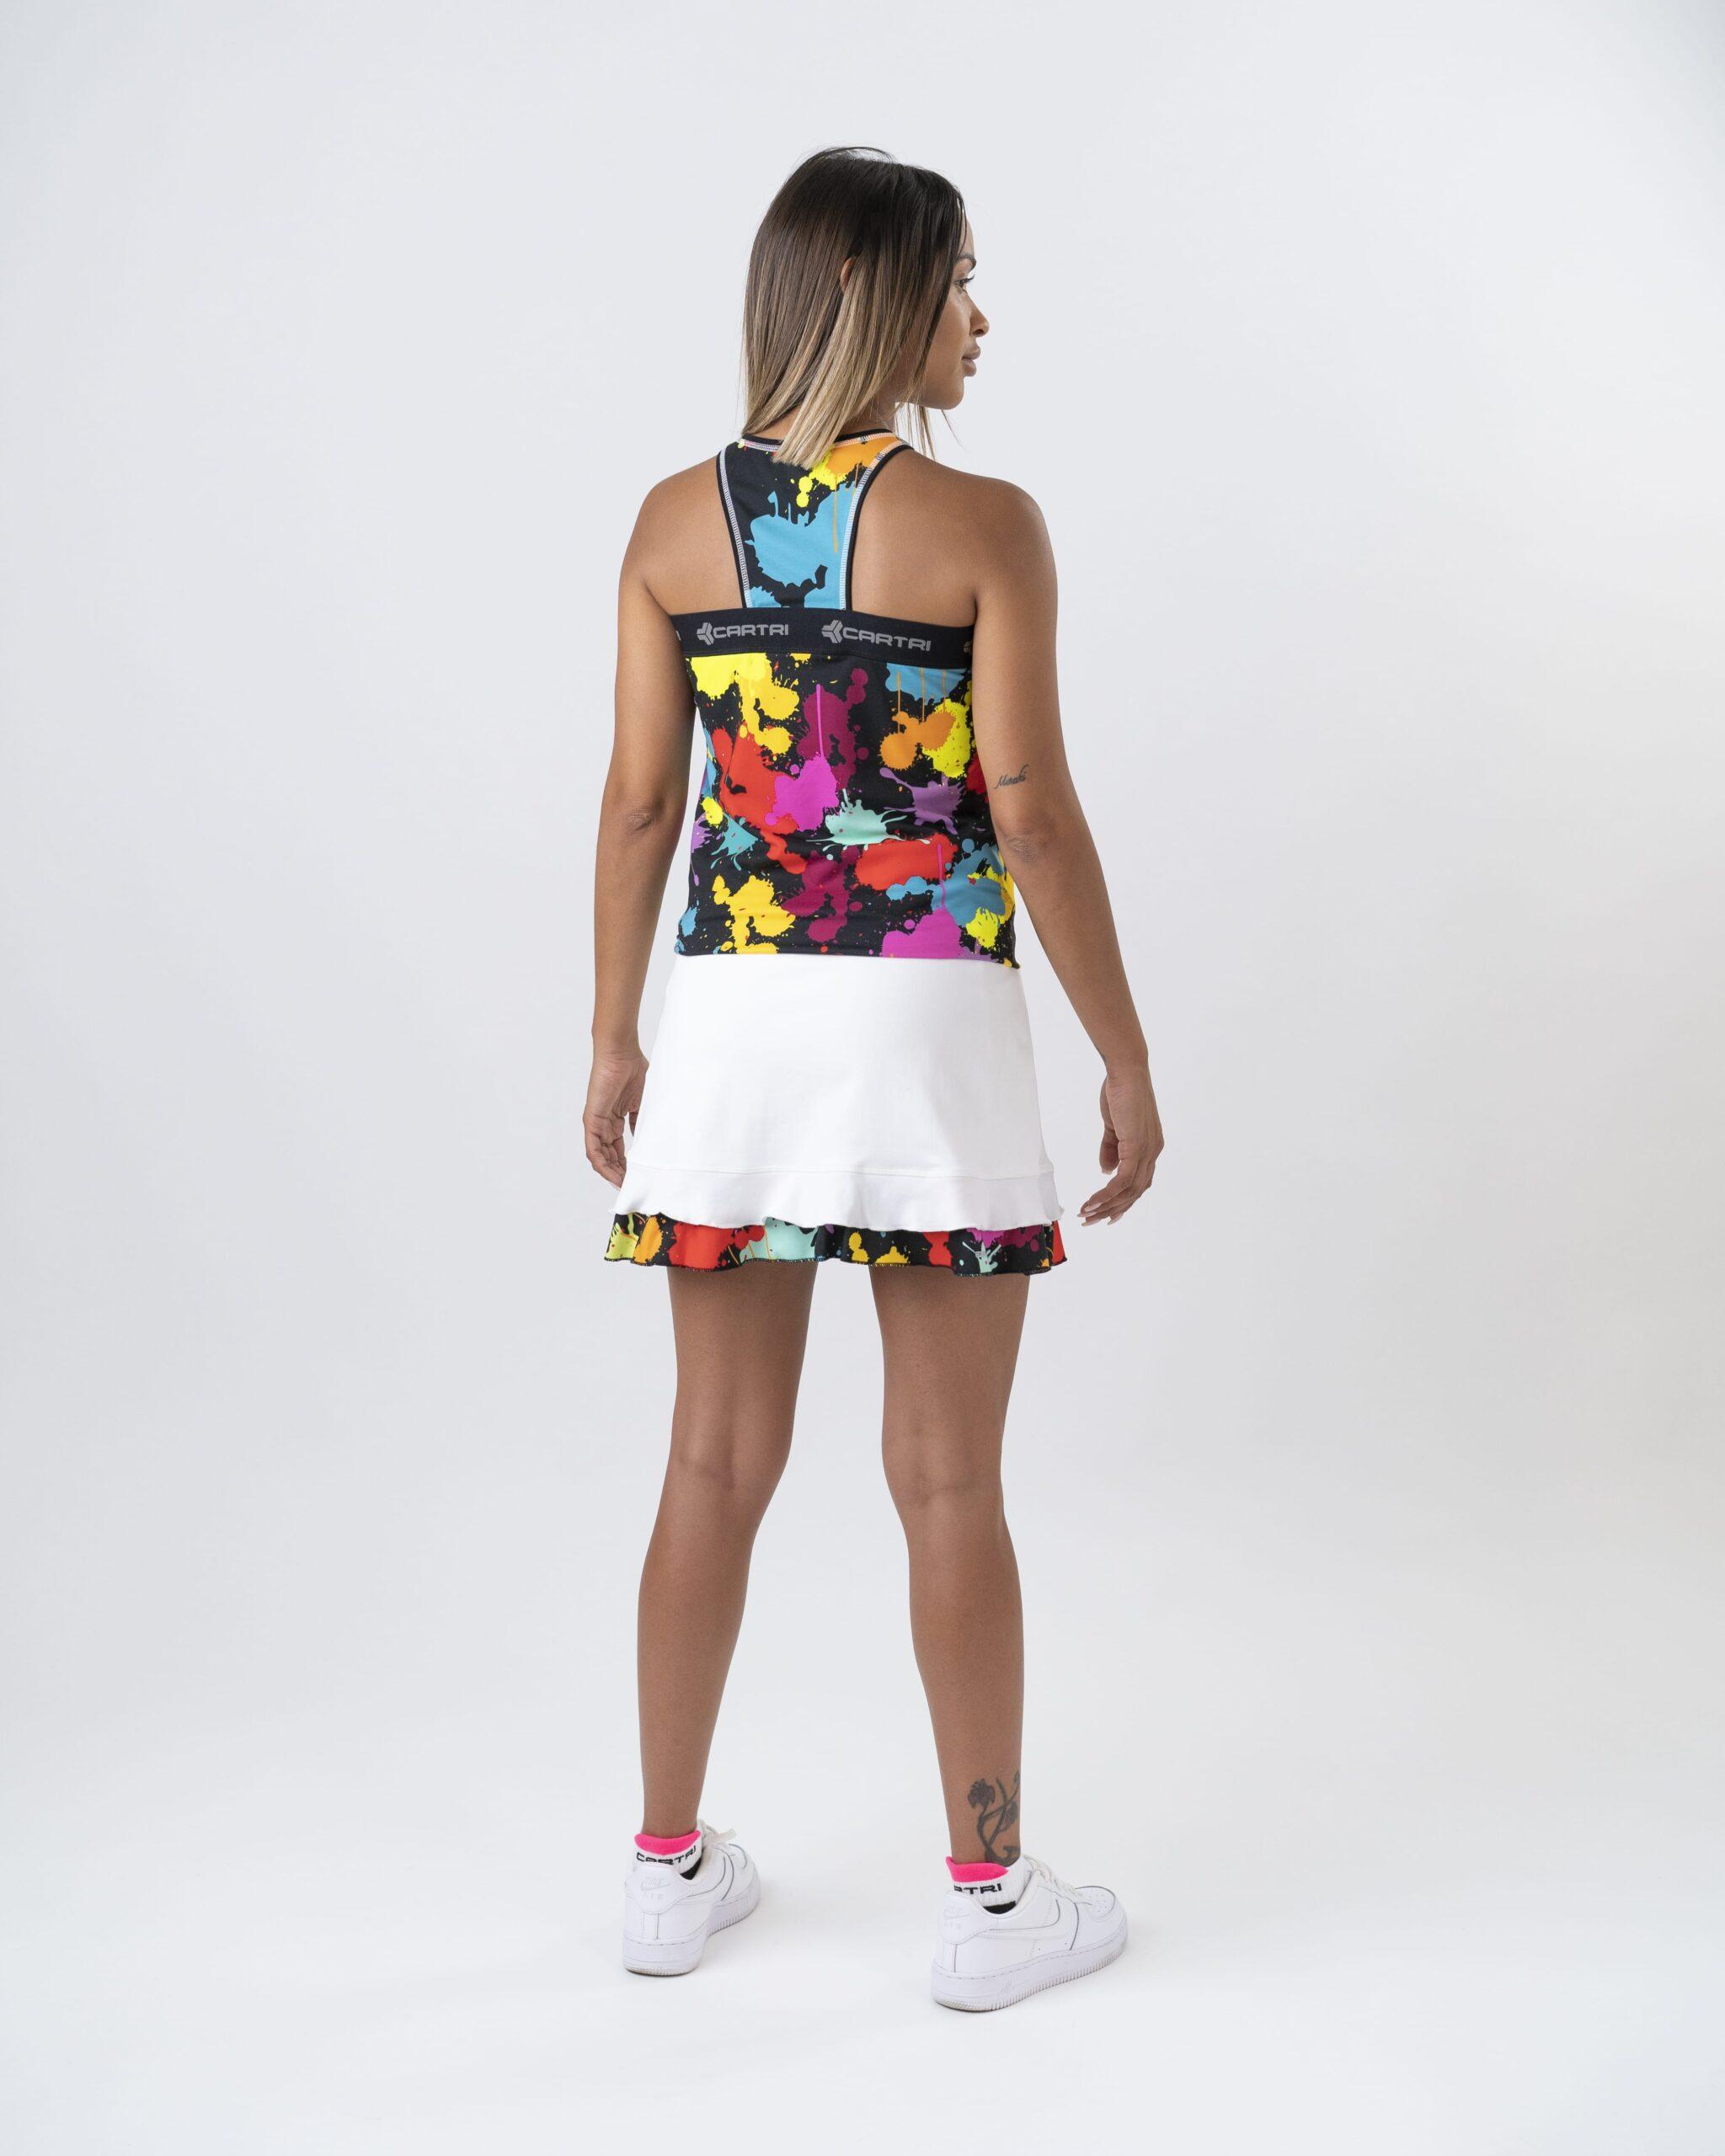 Cartri Splat DosTシャツ女性2021年